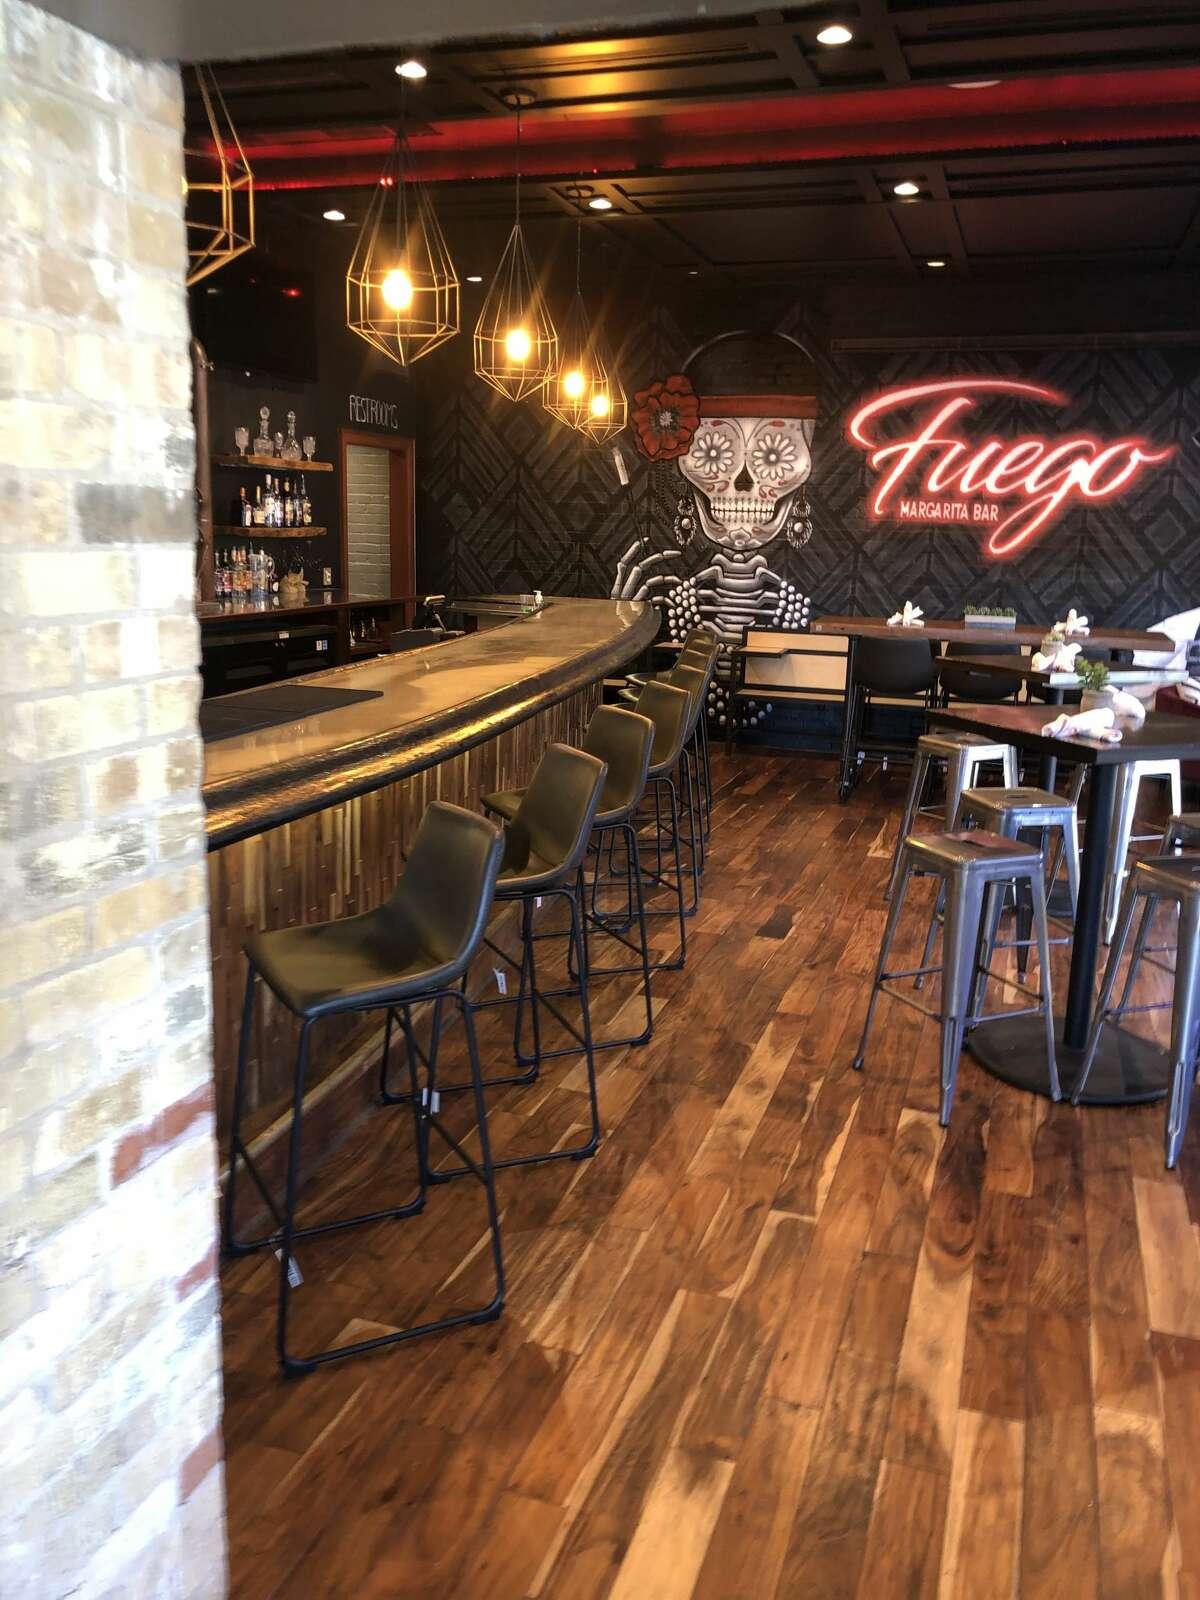 Fuego Margarita Bar 1170E.Commerce St. (next to Smoke BBQ Restaurant) Fuego is aDíadelosMuertos-inspiredspace serving a